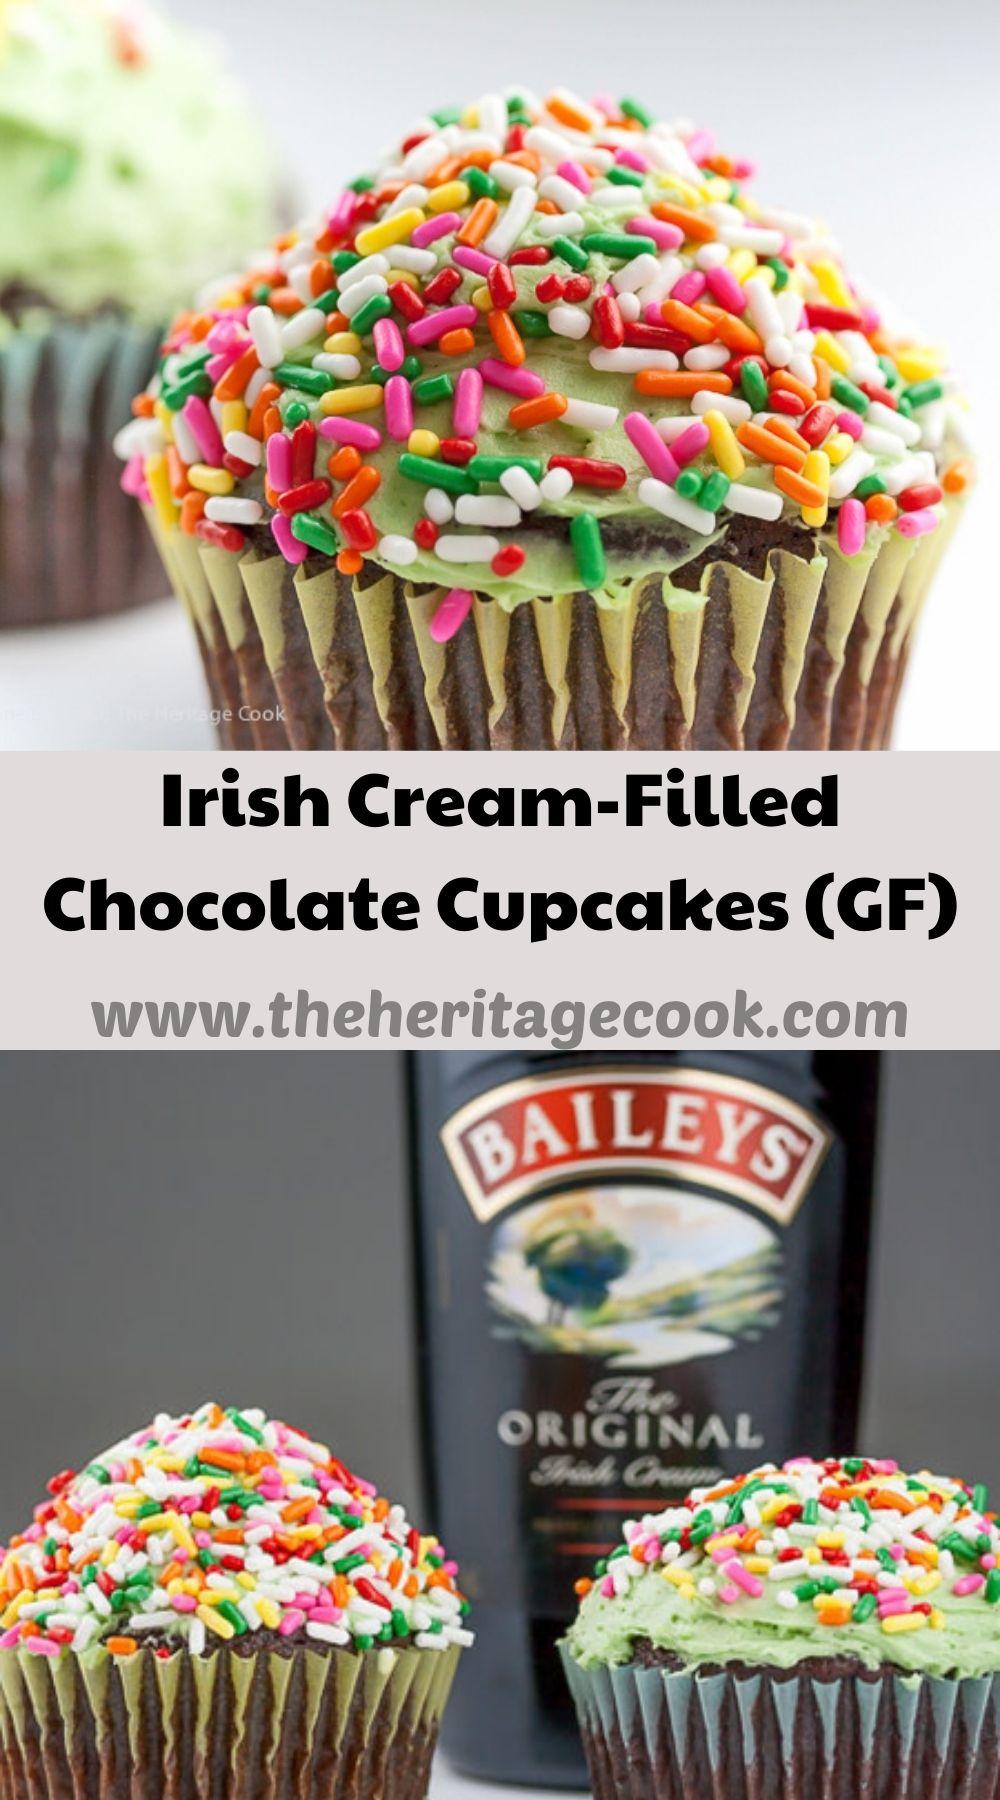 Irish Cream-Filled Chocolate Cupcakes for St. Patrick's Day; 2021 Jane Bonacci, The Heritage Cook